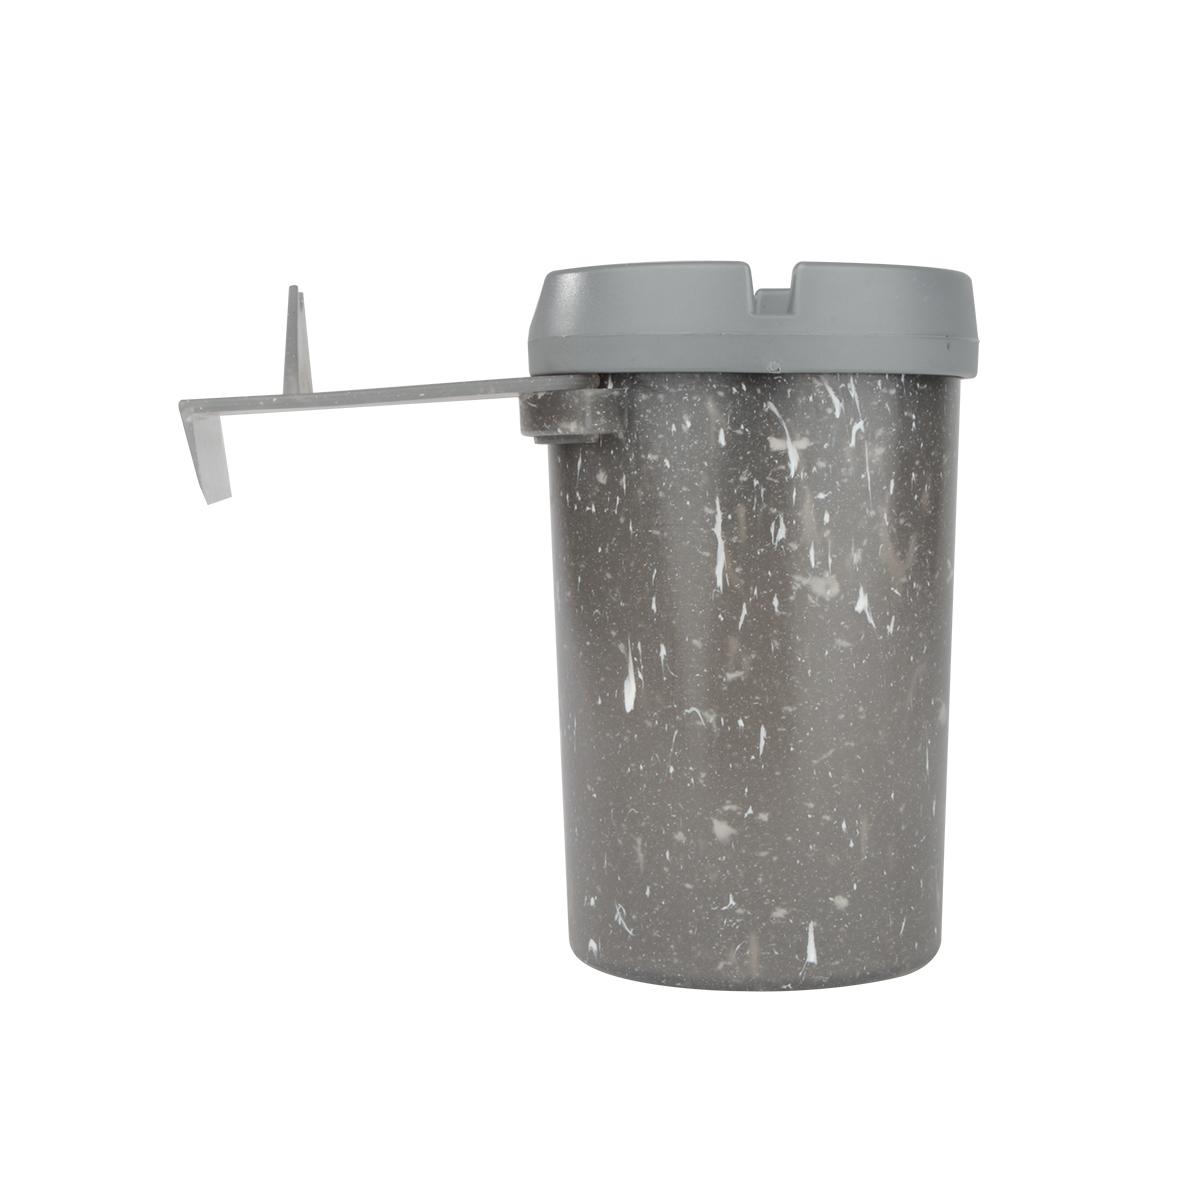 98311 Butt-In Cigarette Self Extinguisher